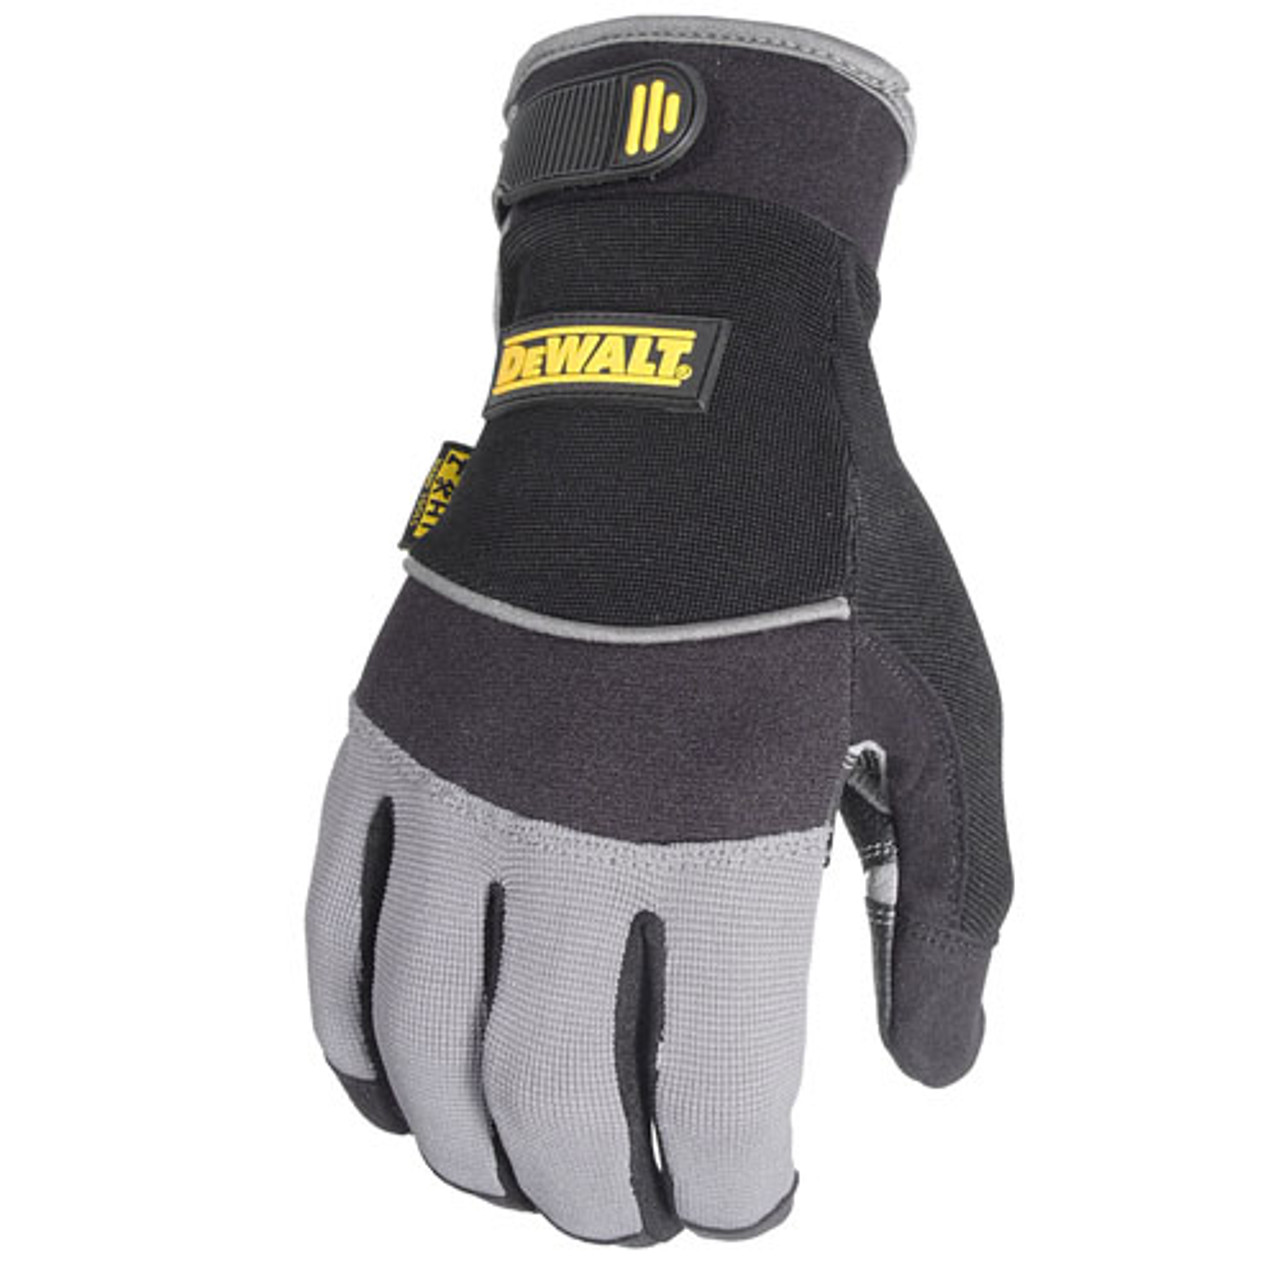 DeWALT Leather Palm Work Gloves Size LARGE Glove DPG41L